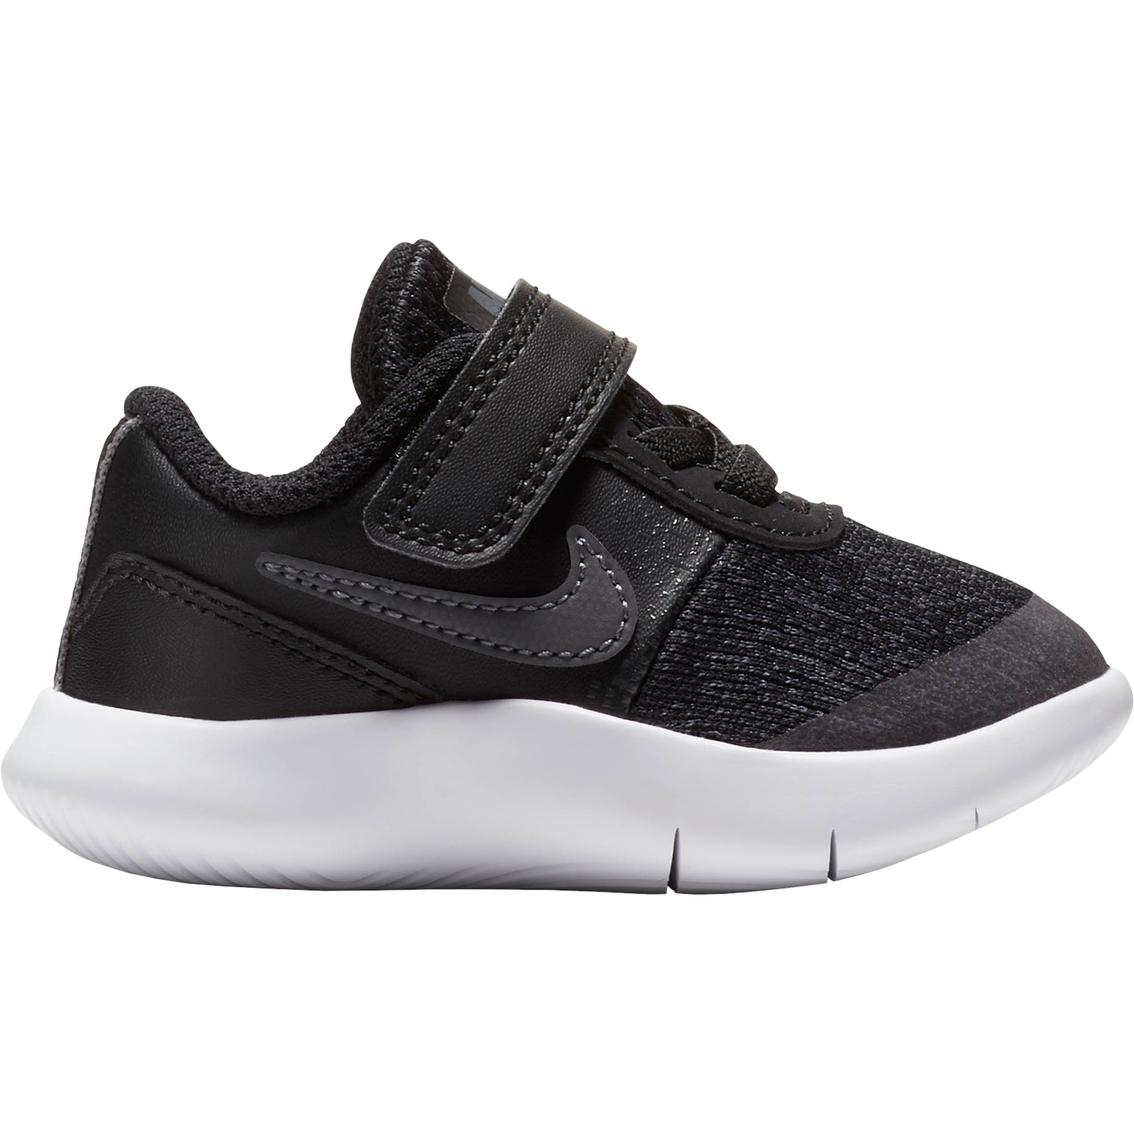 best website 247c2 ea1ee Nike Toddler Boys Flex Contact TDV Running Shoes